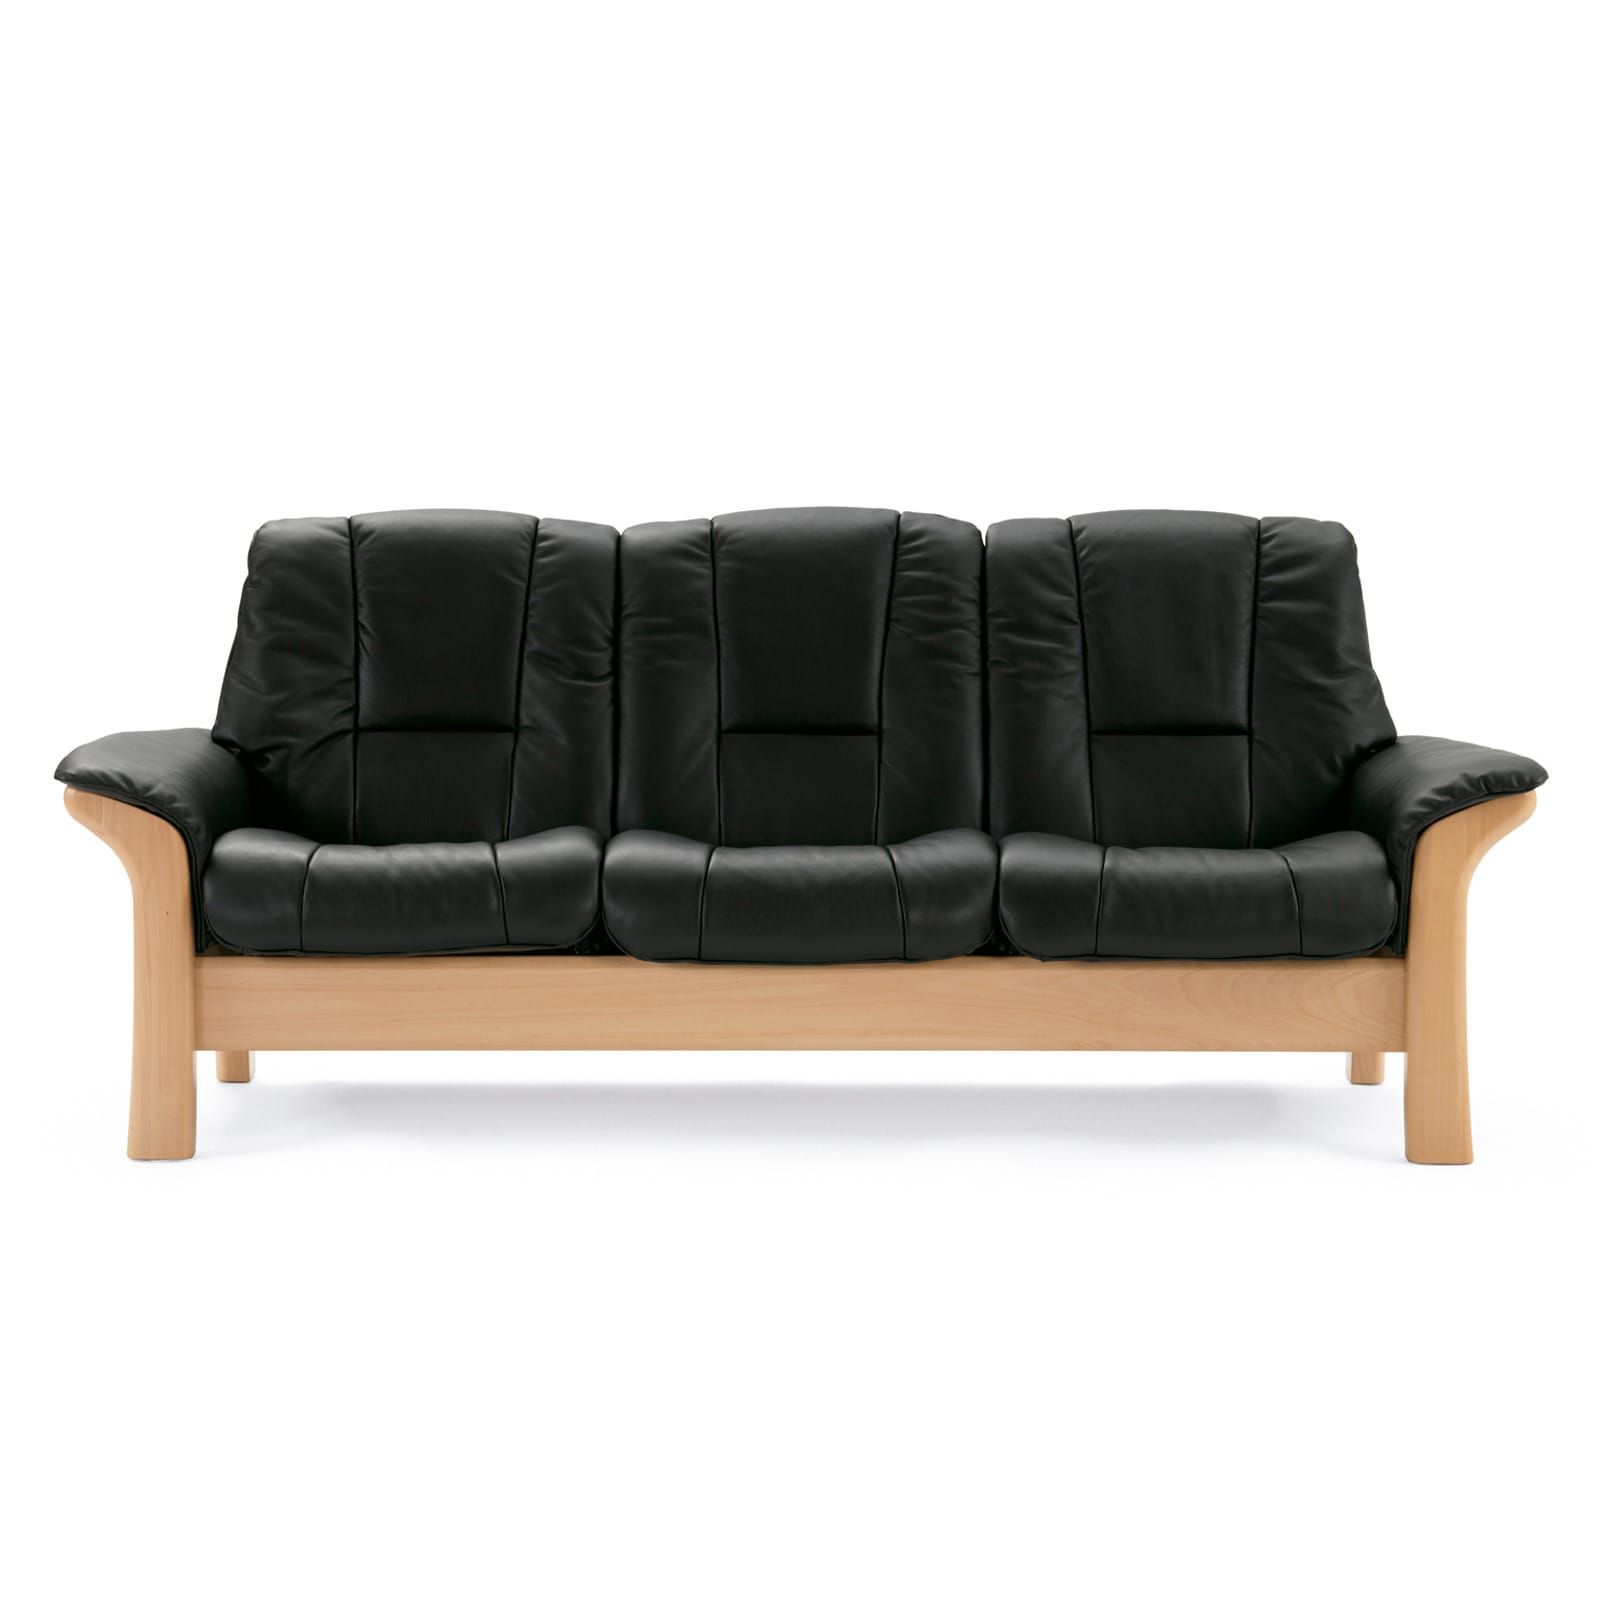 stressless sofa 3 sitzer buckingham l hoch black natur. Black Bedroom Furniture Sets. Home Design Ideas